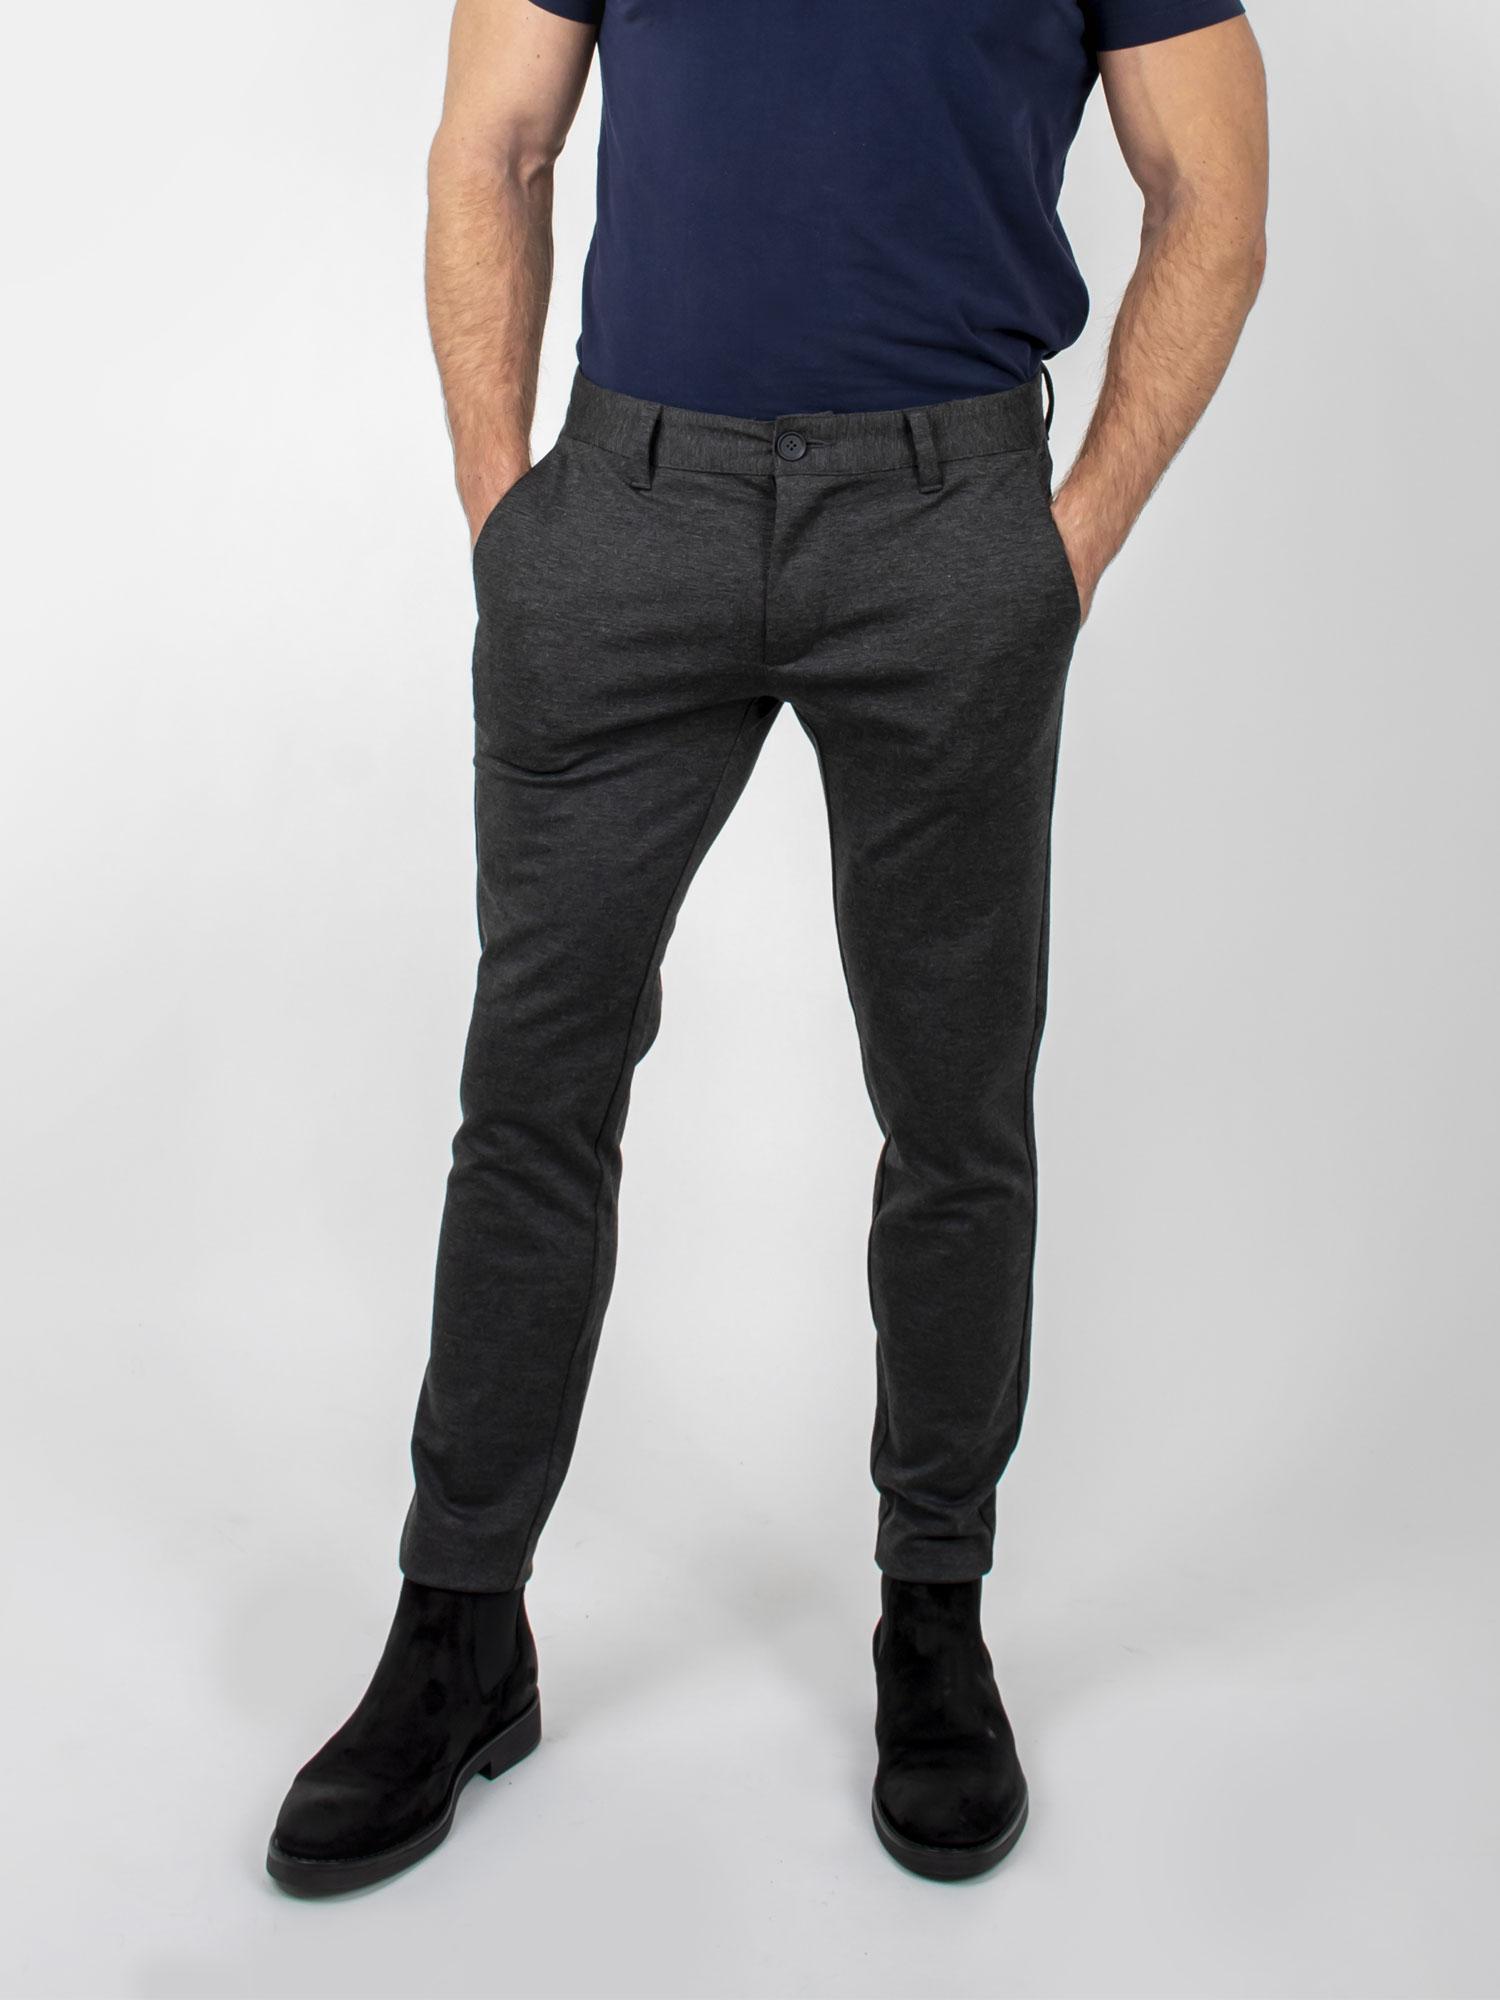 Performance Pants, Only & Sons, Mark chinos, dark grey melange, 30/30